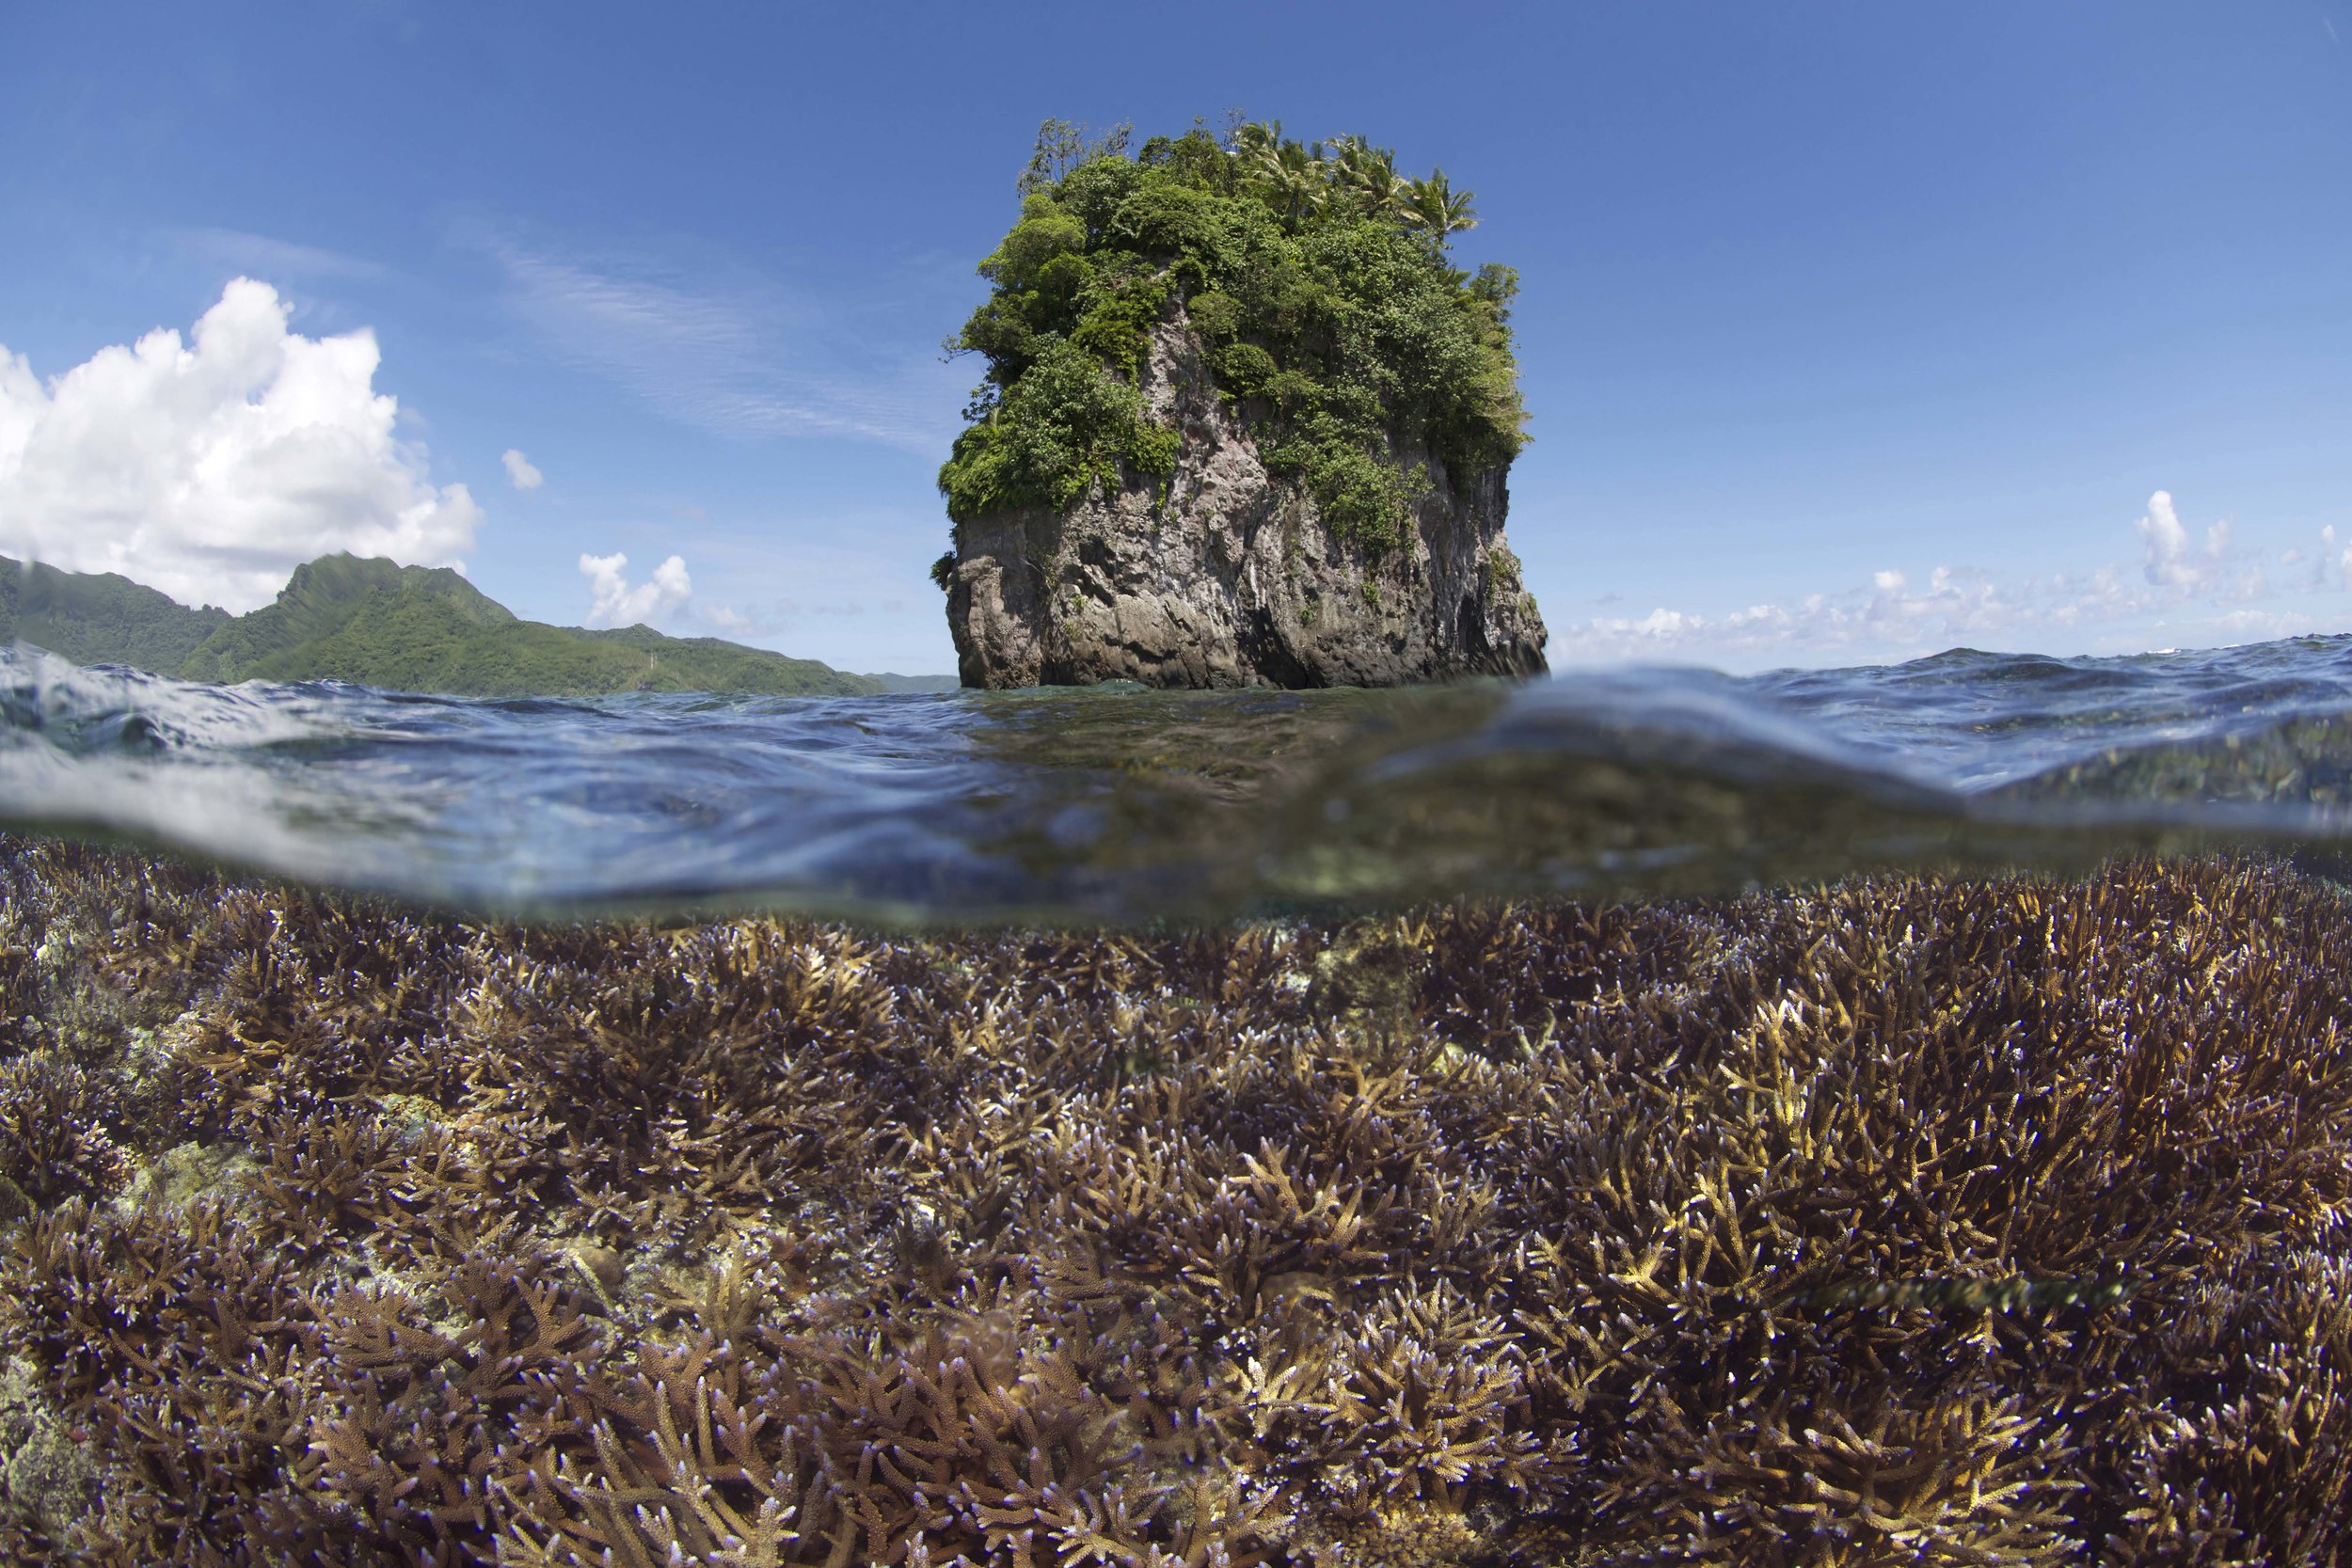 before bleaching - American Samoa - dec 2014 credit: the ocean agency / xl catlin seaview survey